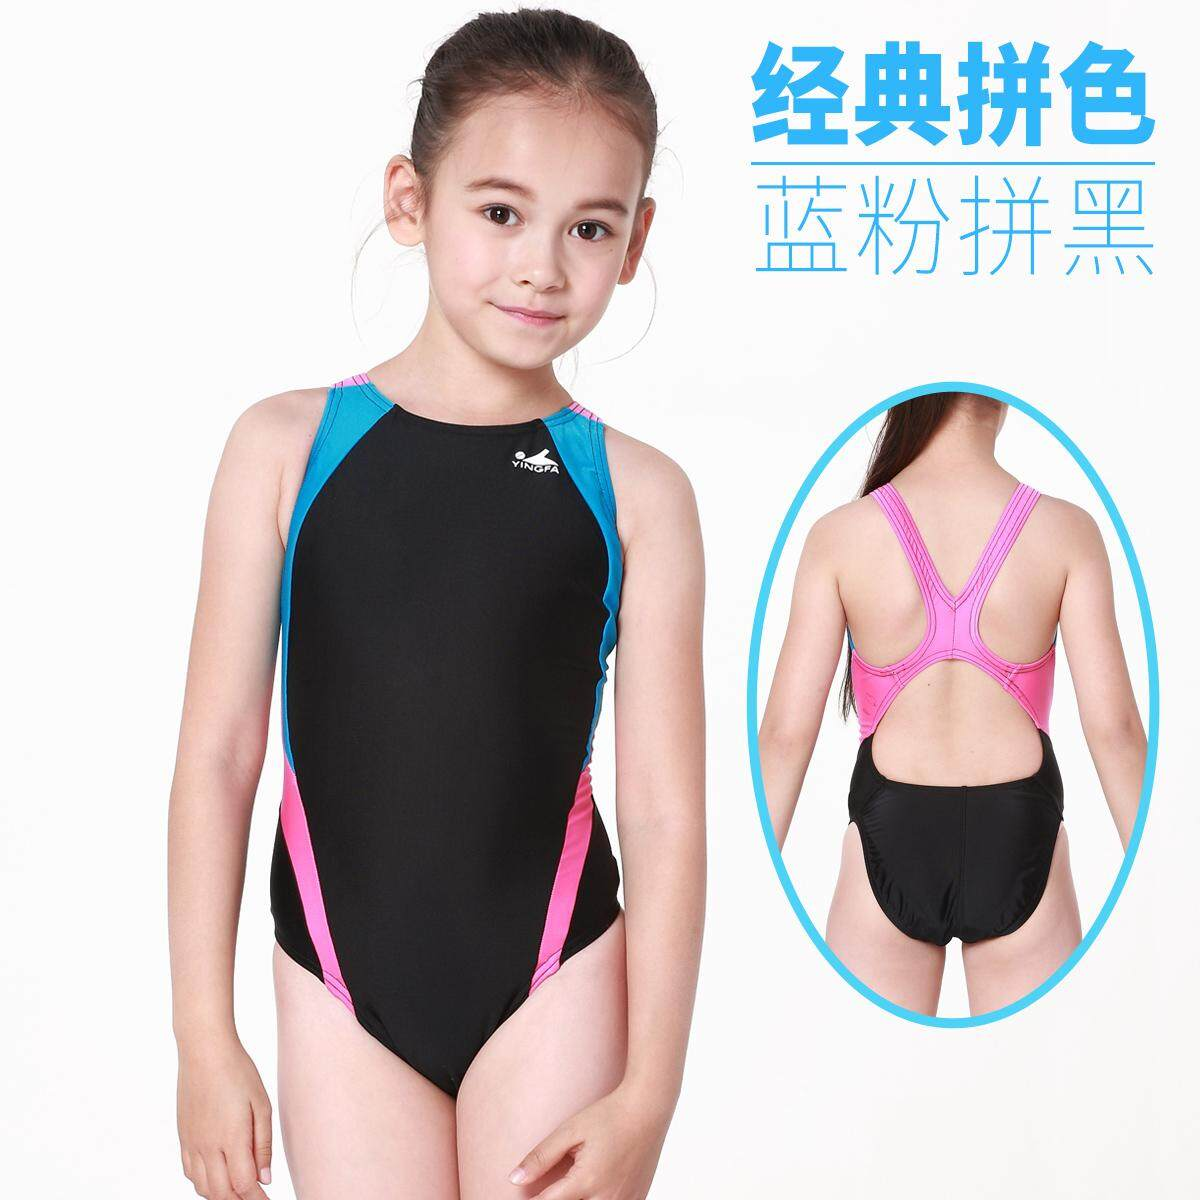 Yingfa baju renang anak anak perempuan Profesional pelatihan anak prempuan  besar perawan CLASSIC dewasa pertandingan Terusan 8bcdb7cecc